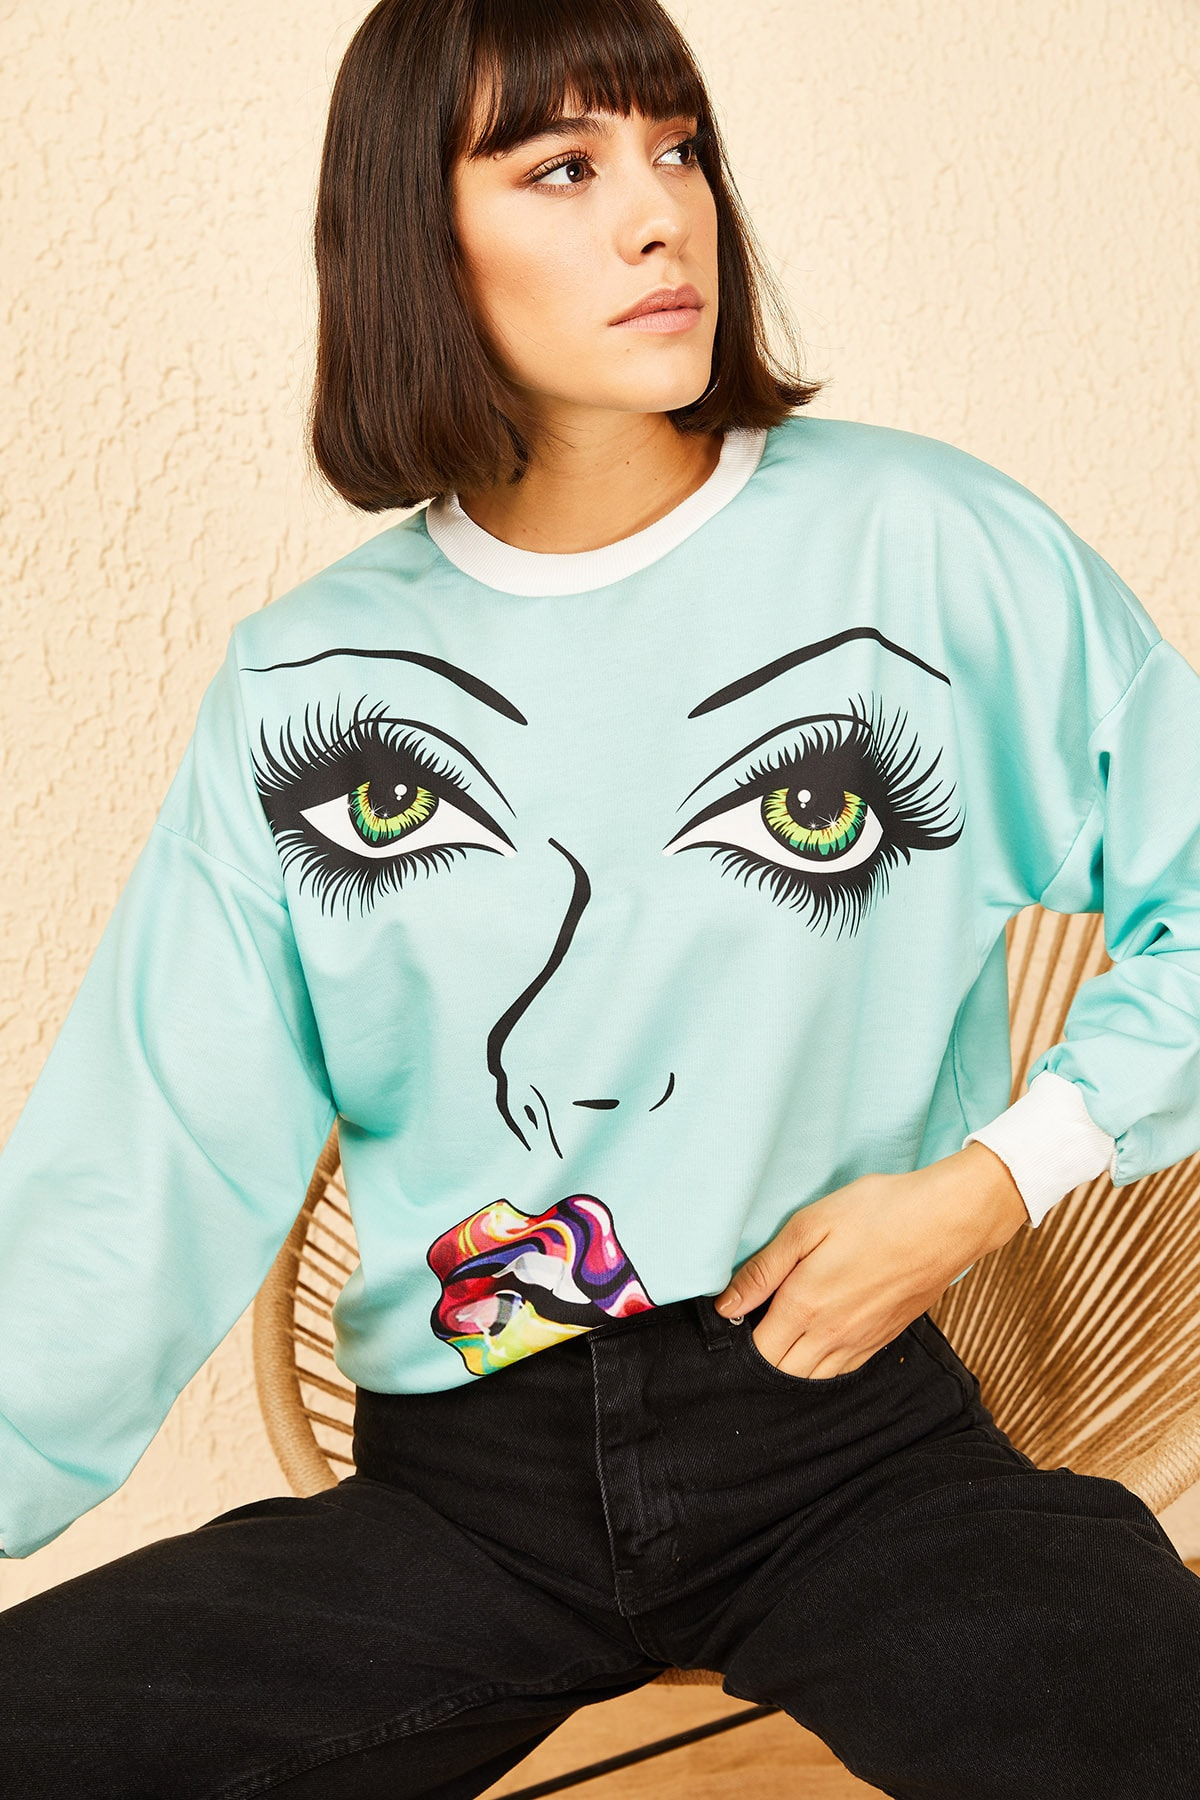 Bianco Lucci Kadın Yeşil Göz Baskılı Sweatshirt